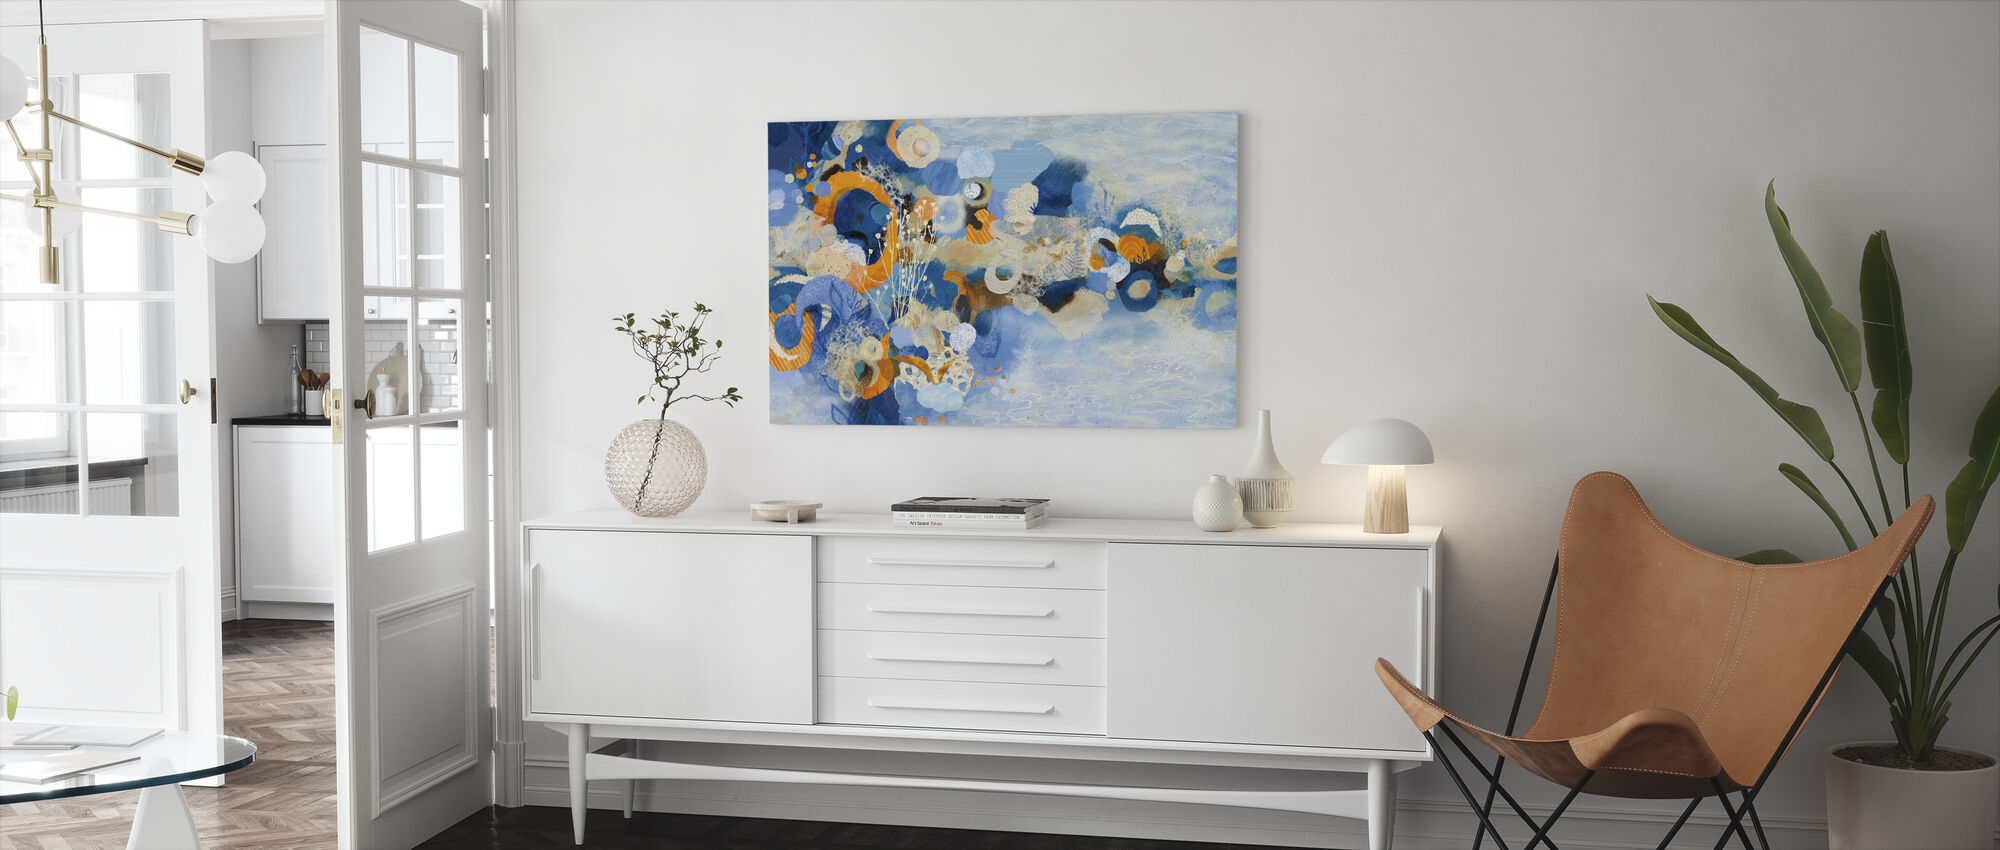 Nantucket Summer - Canvas print - Living Room